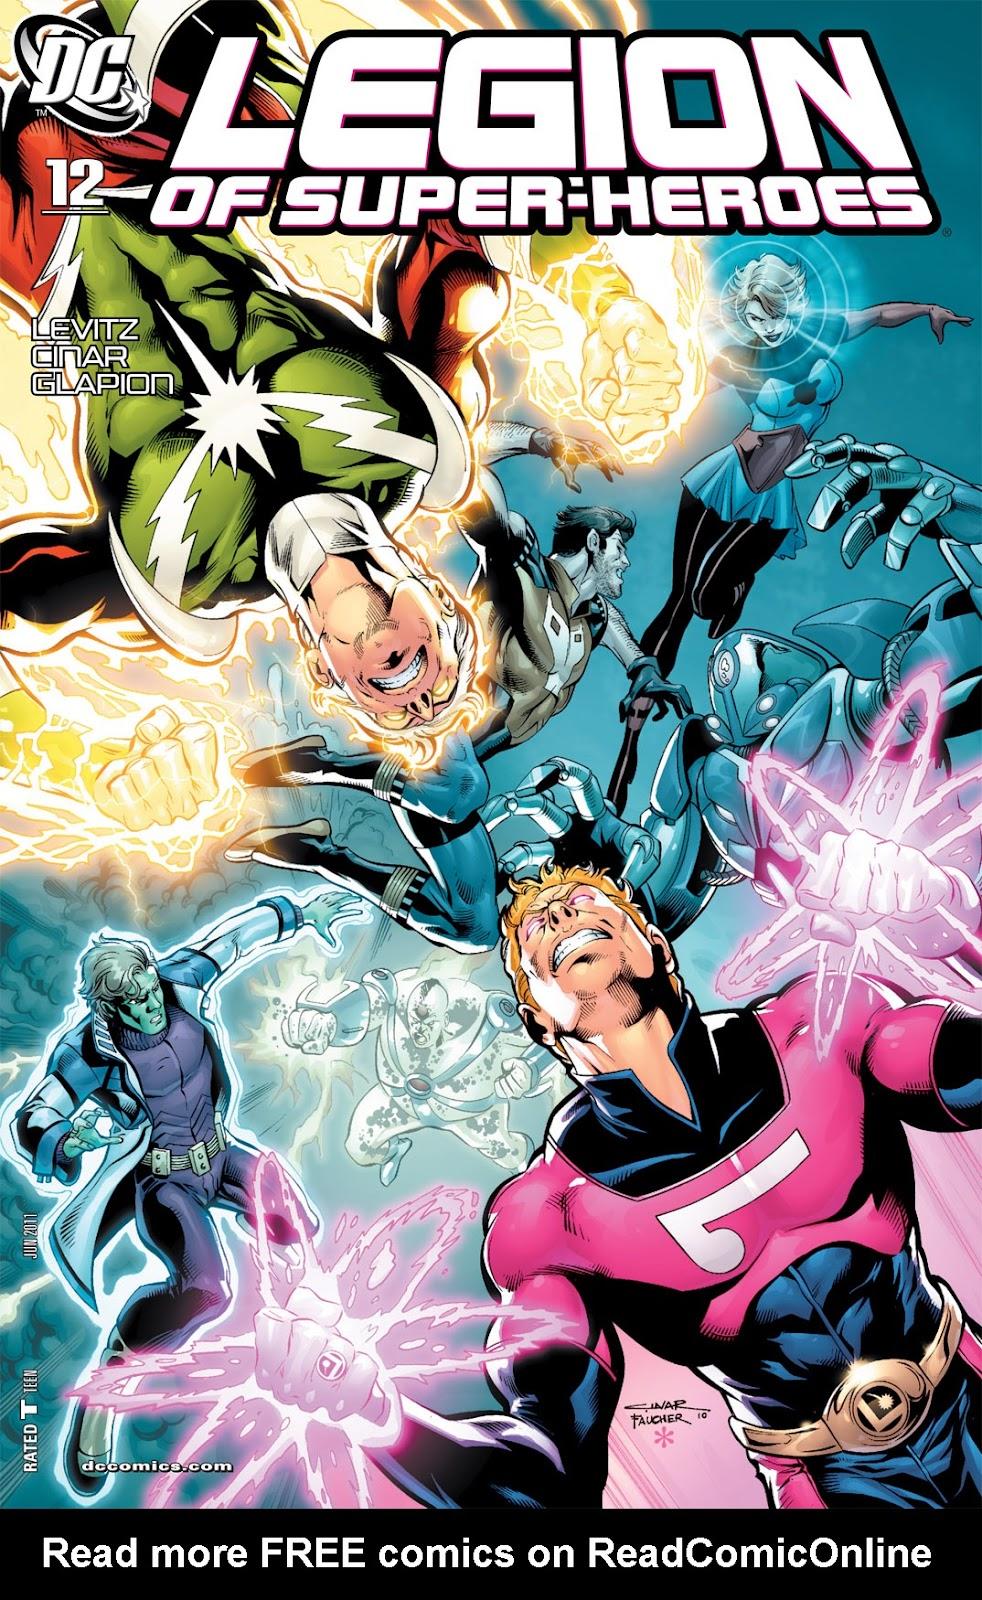 Legion of Super-Heroes (2010) Issue #12 #13 - English 1